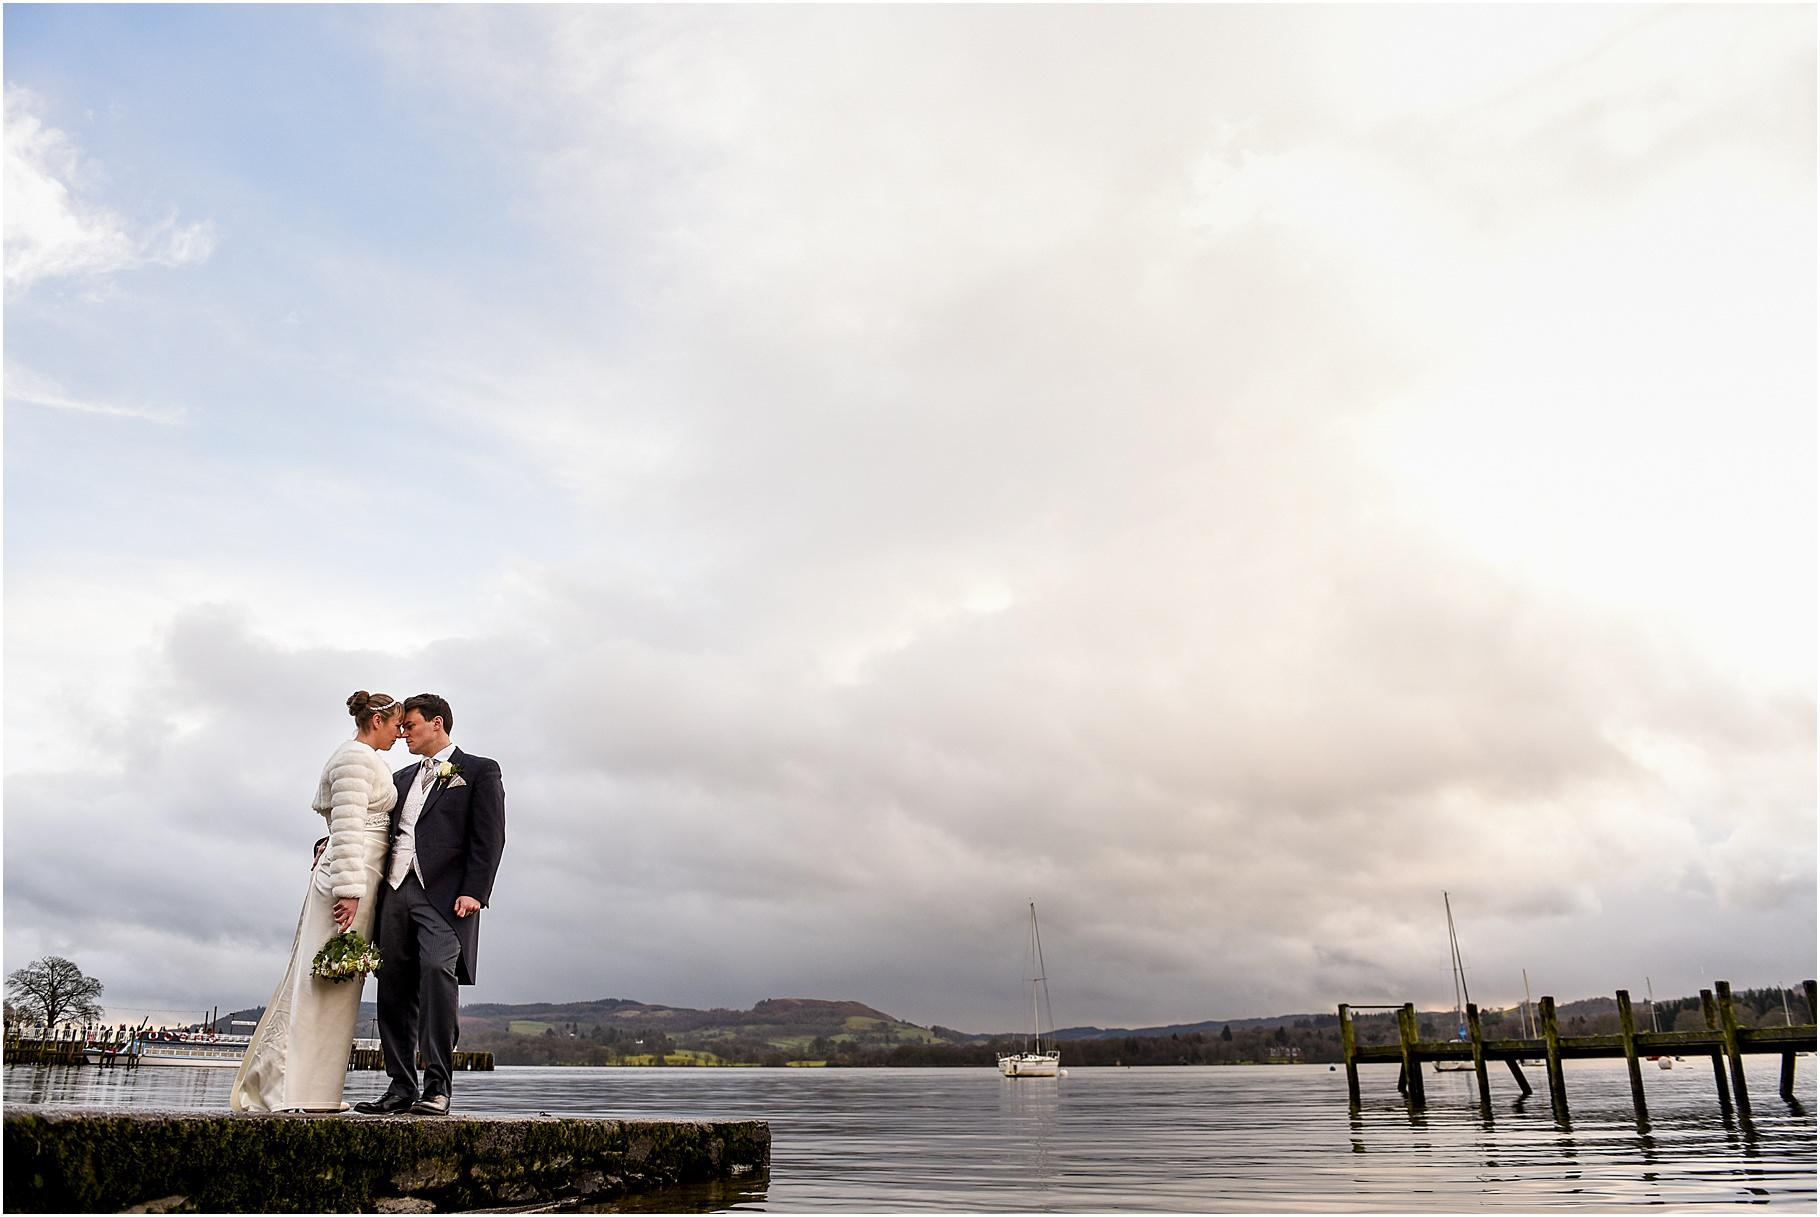 dan-wootton-photography-2017-weddings-129.jpg